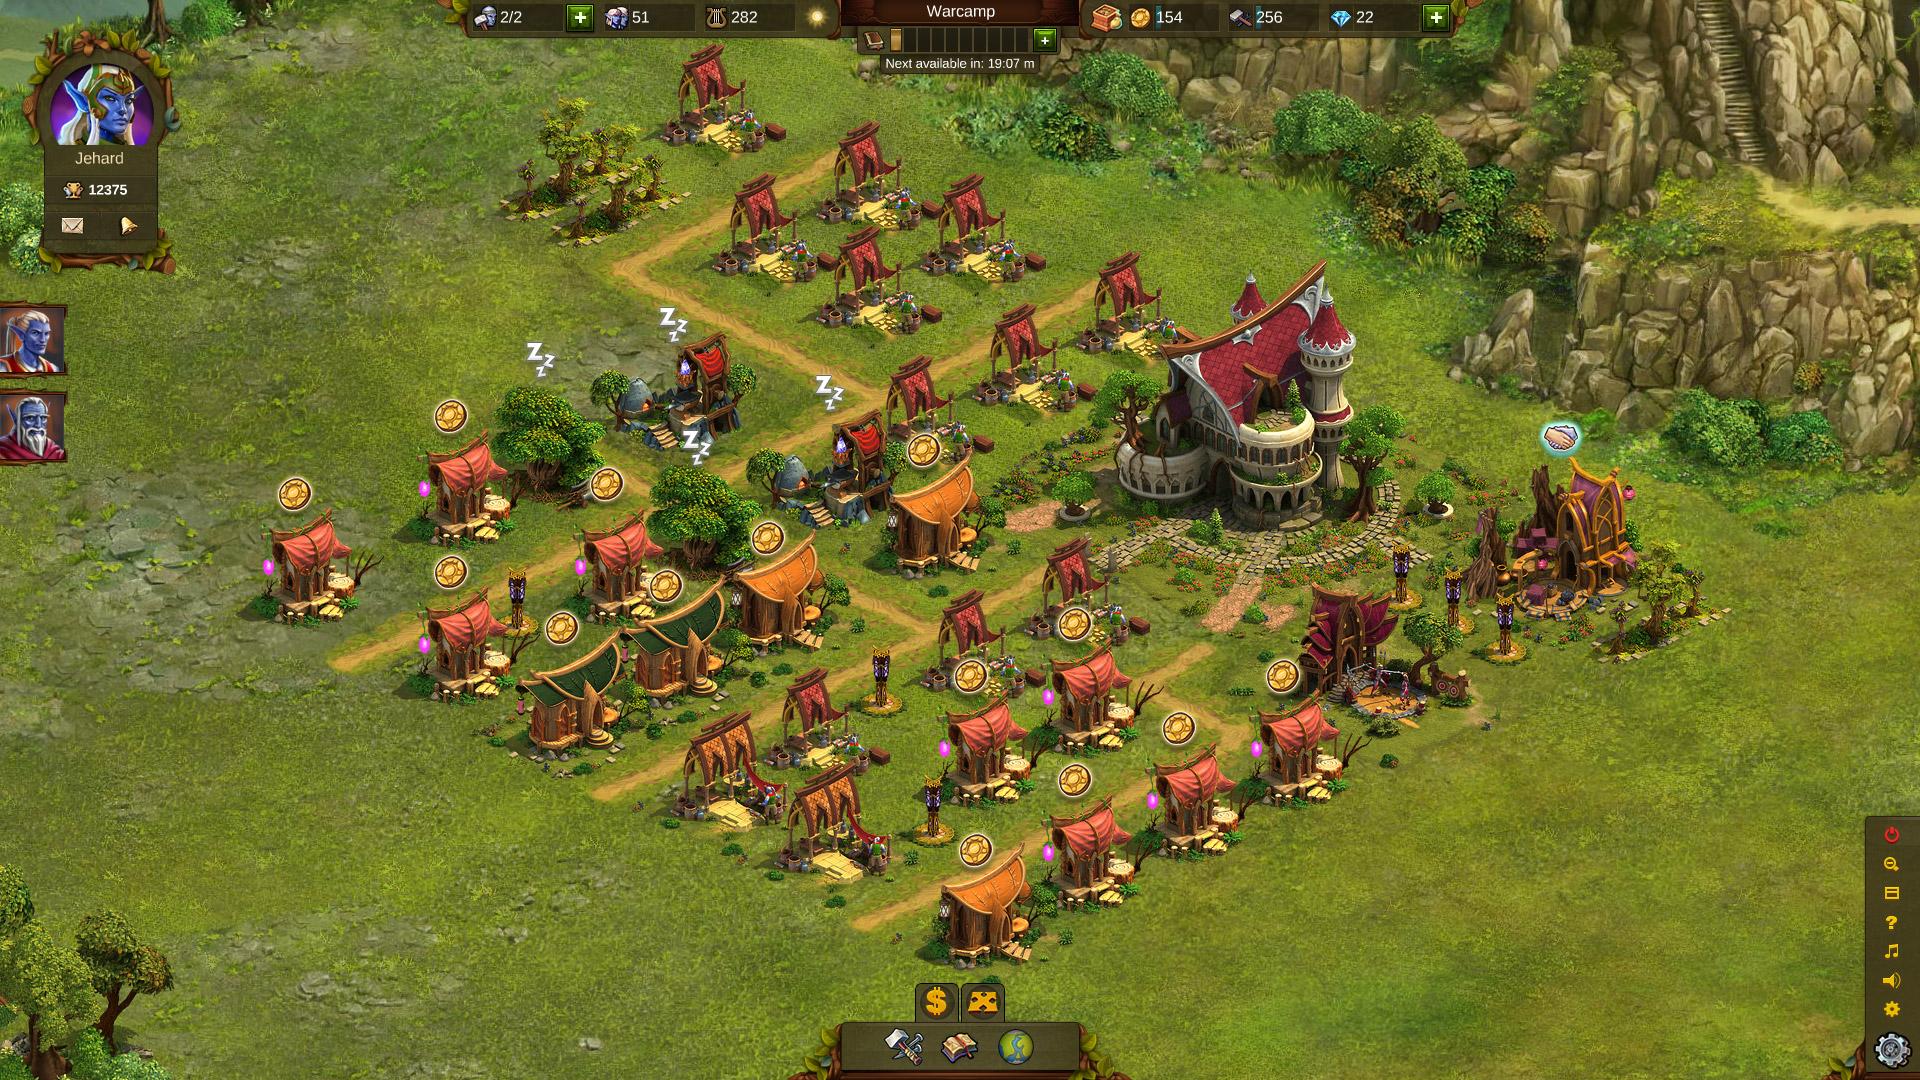 Elvenar - Free MMO Games